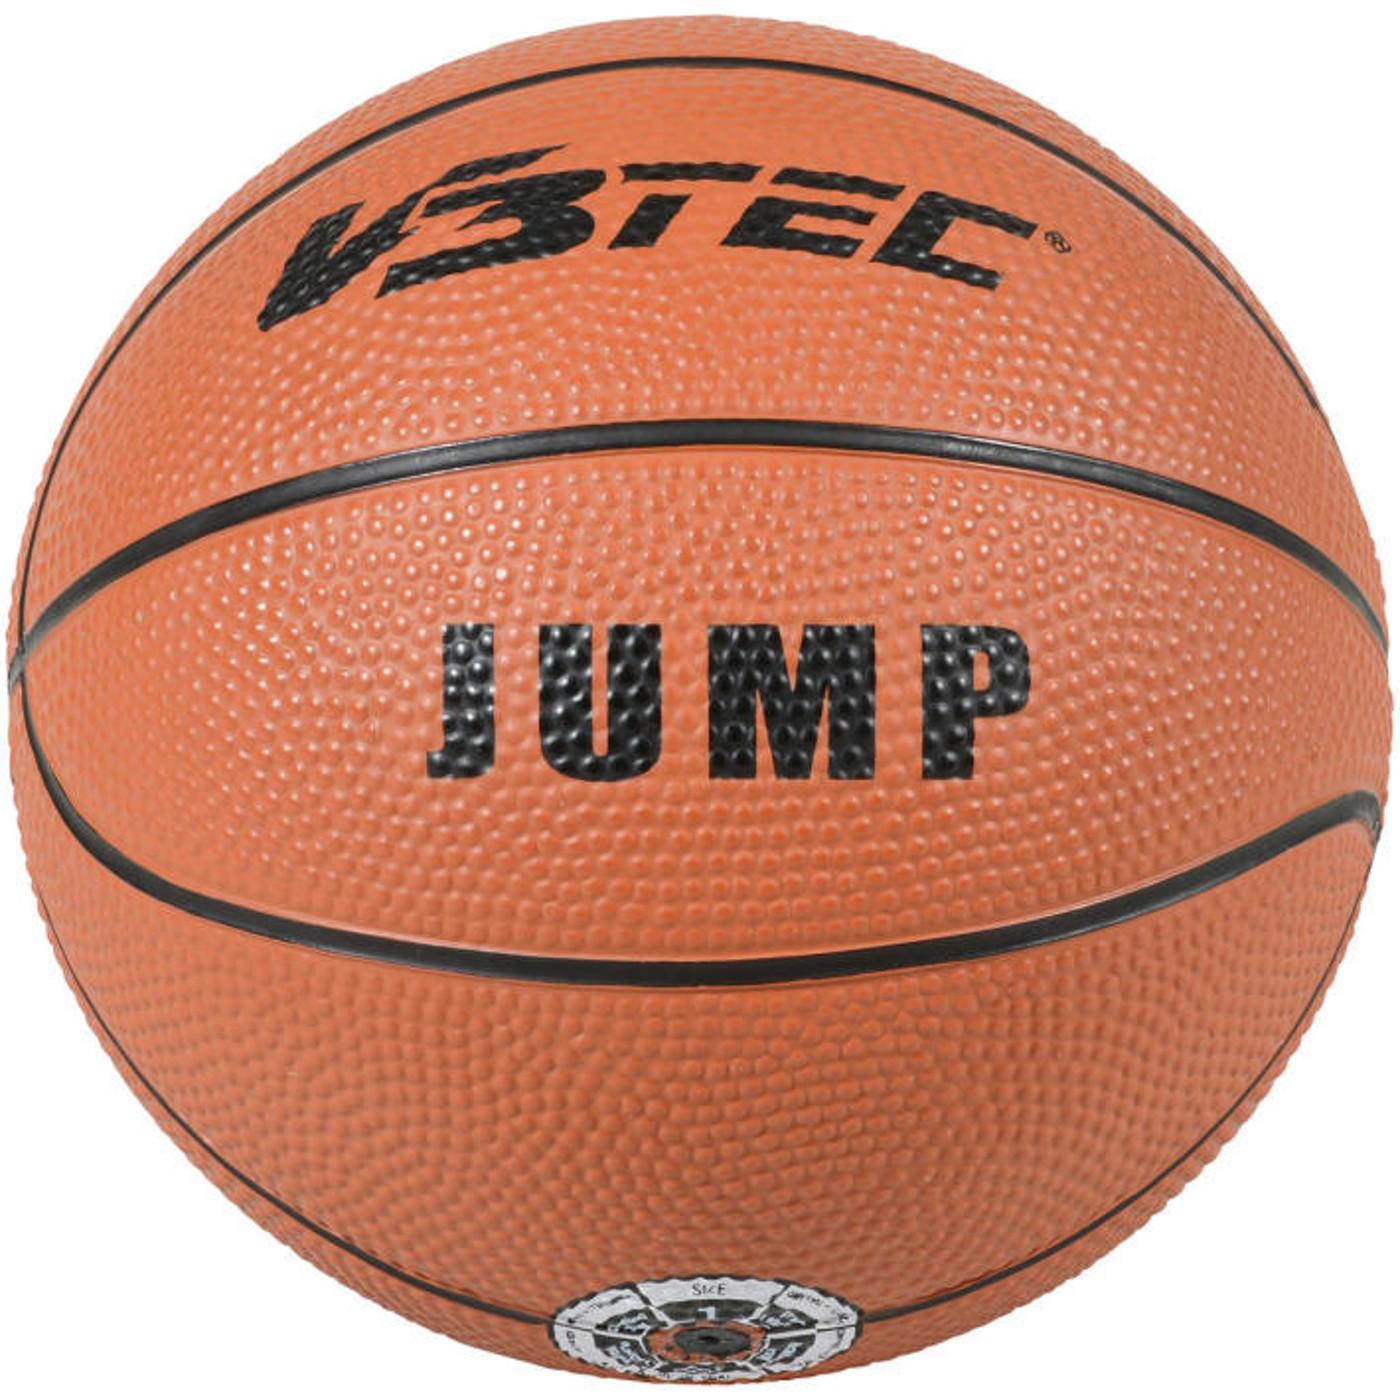 V3TEC JUMP MINI